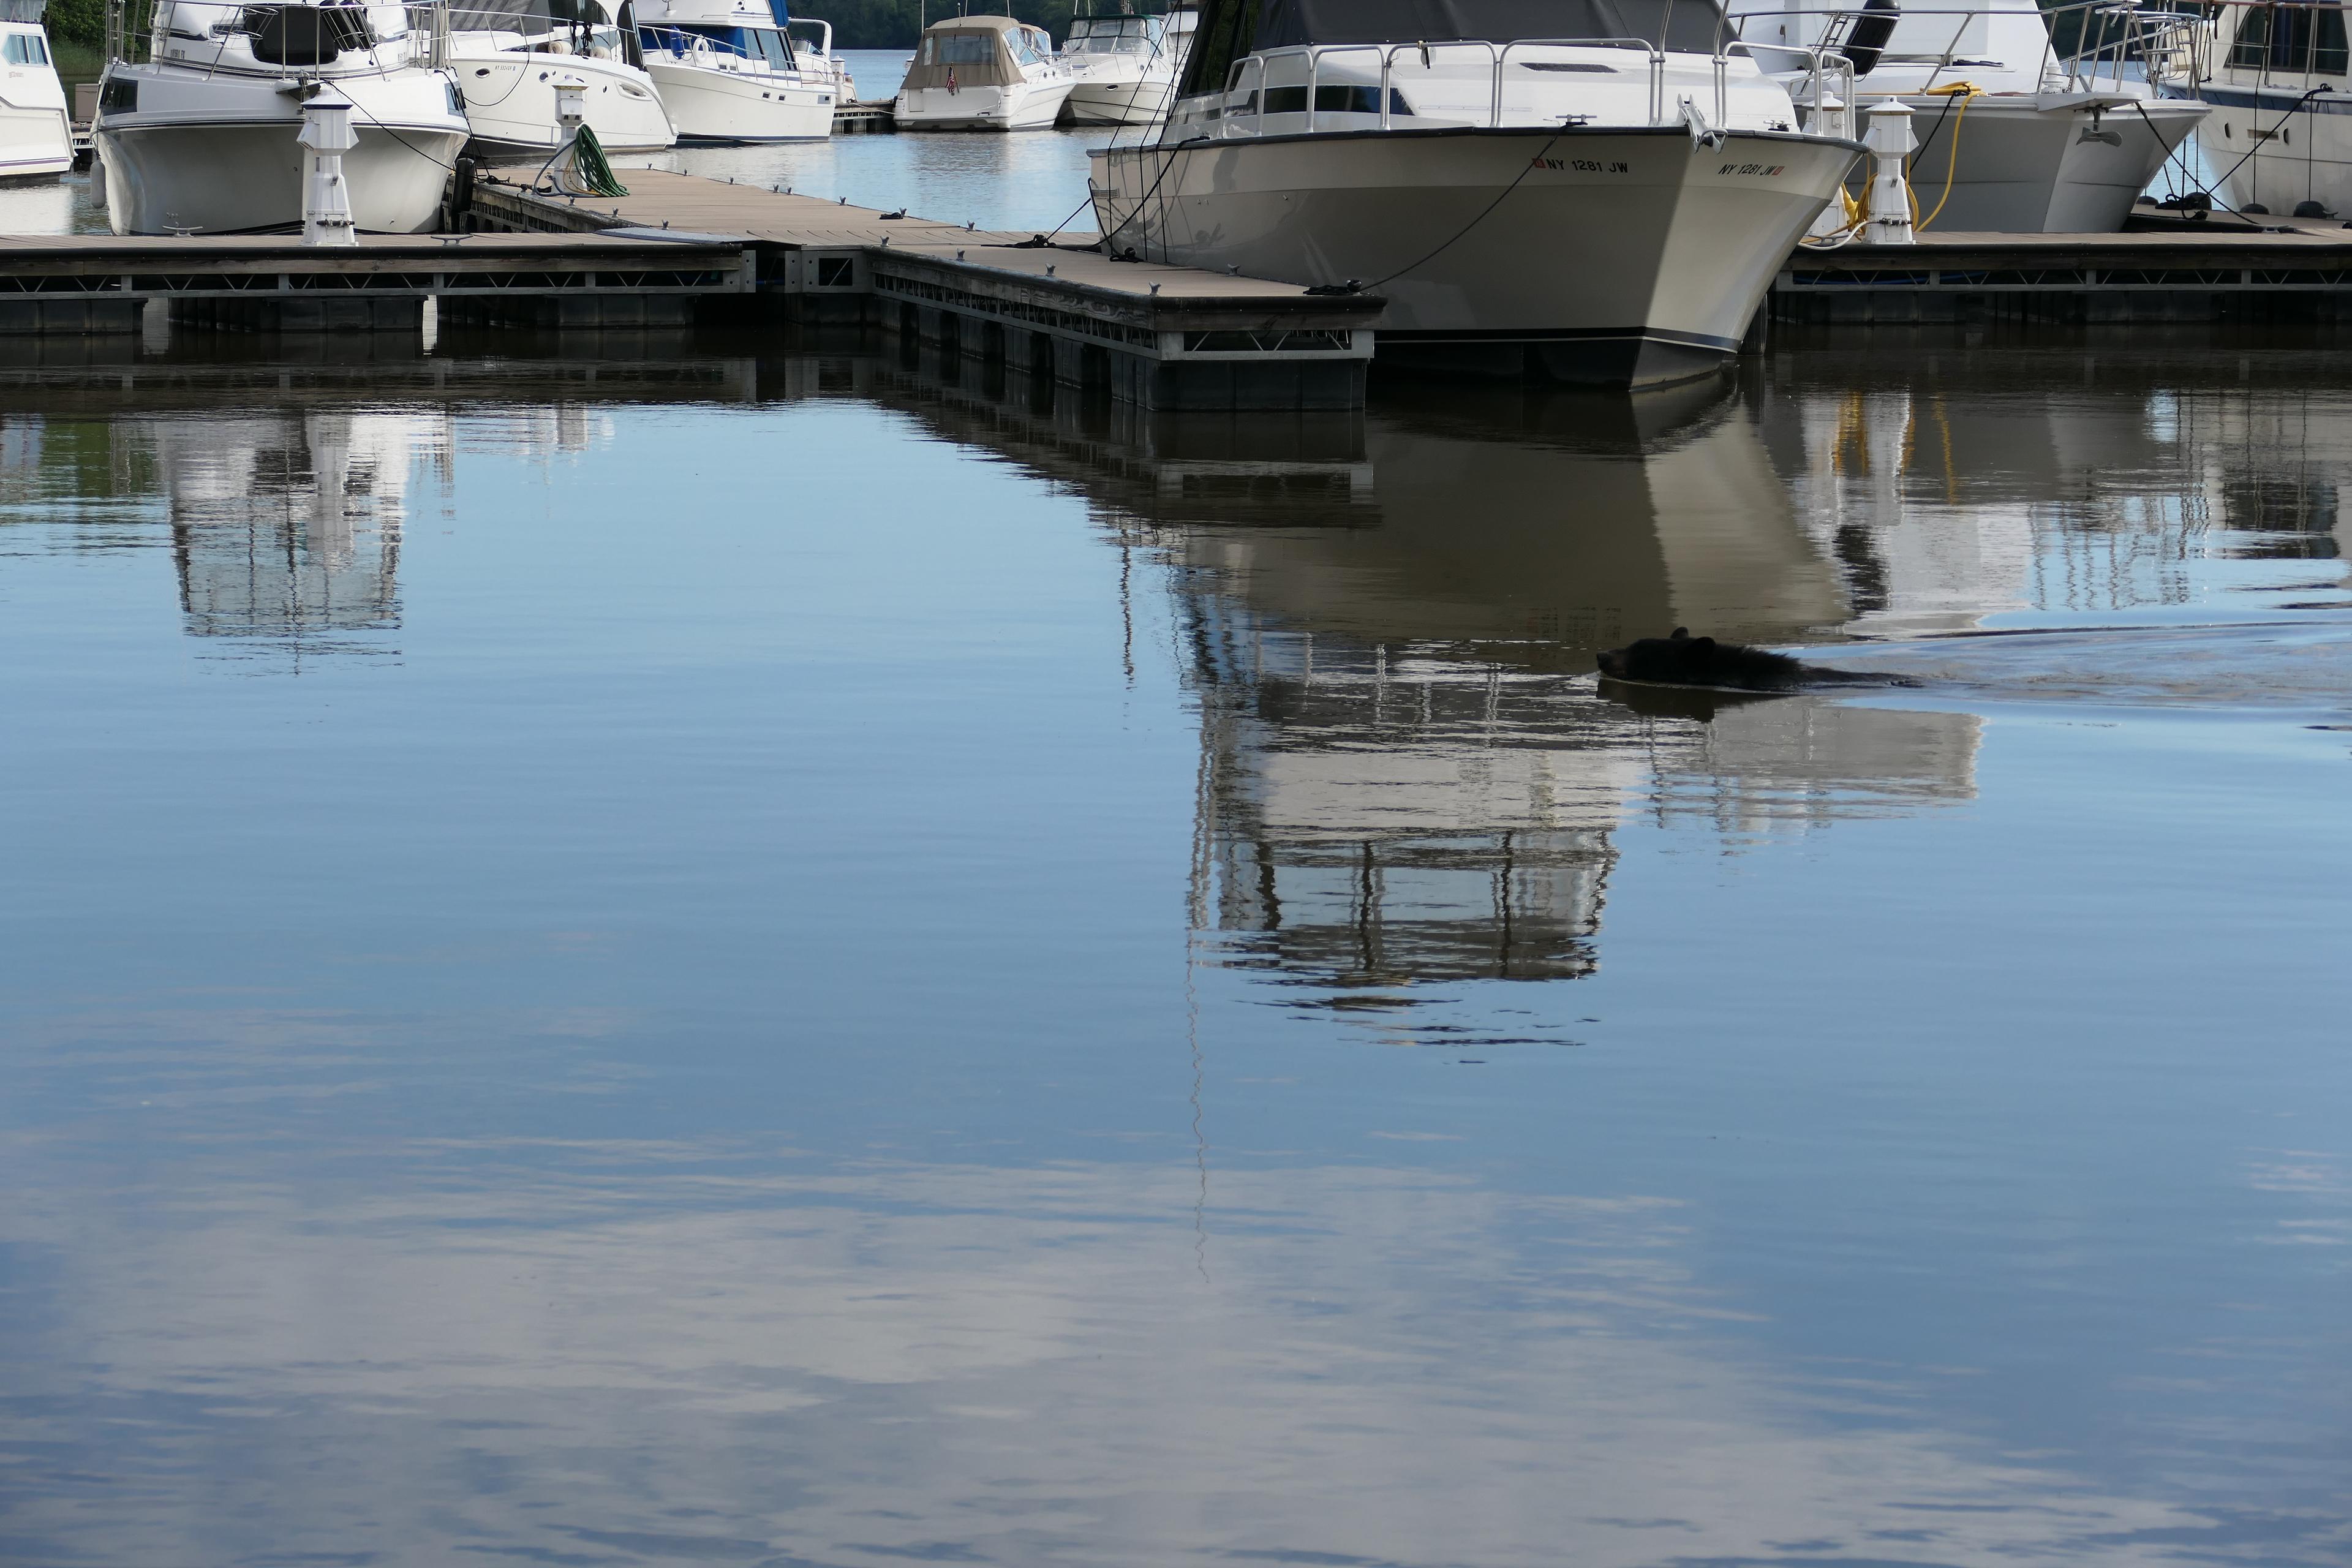 Paddling between the boats